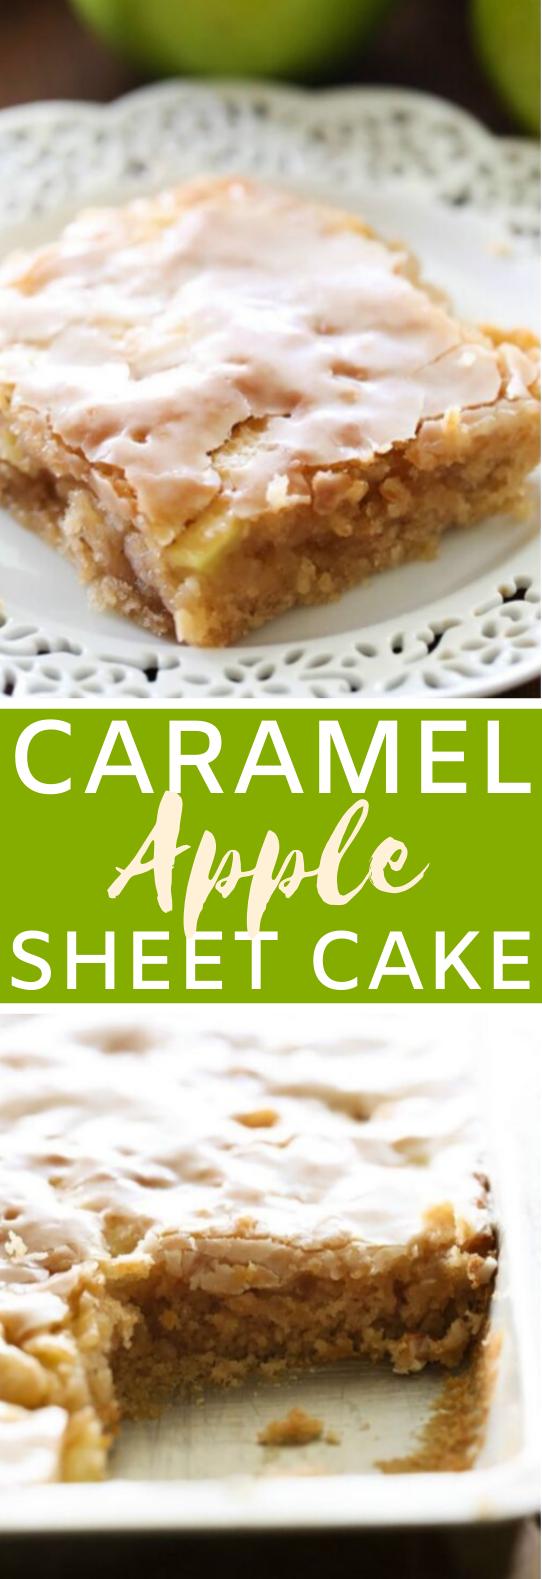 Caramel Apple Sheet Cake #desserts #cake #baking #recipes #fall